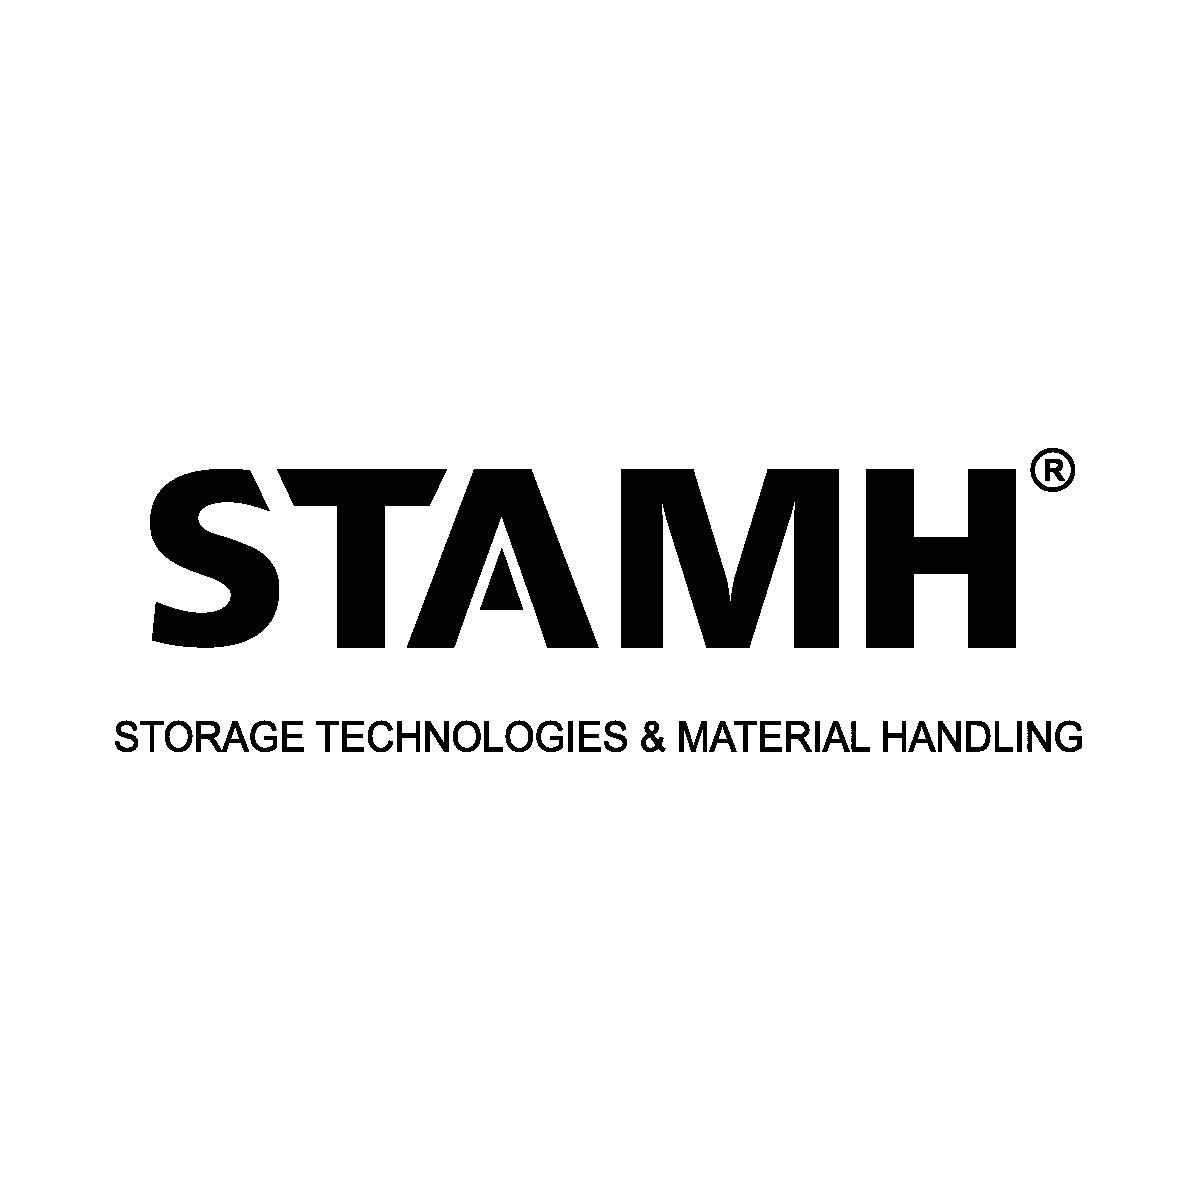 3-D visualization of Live storage